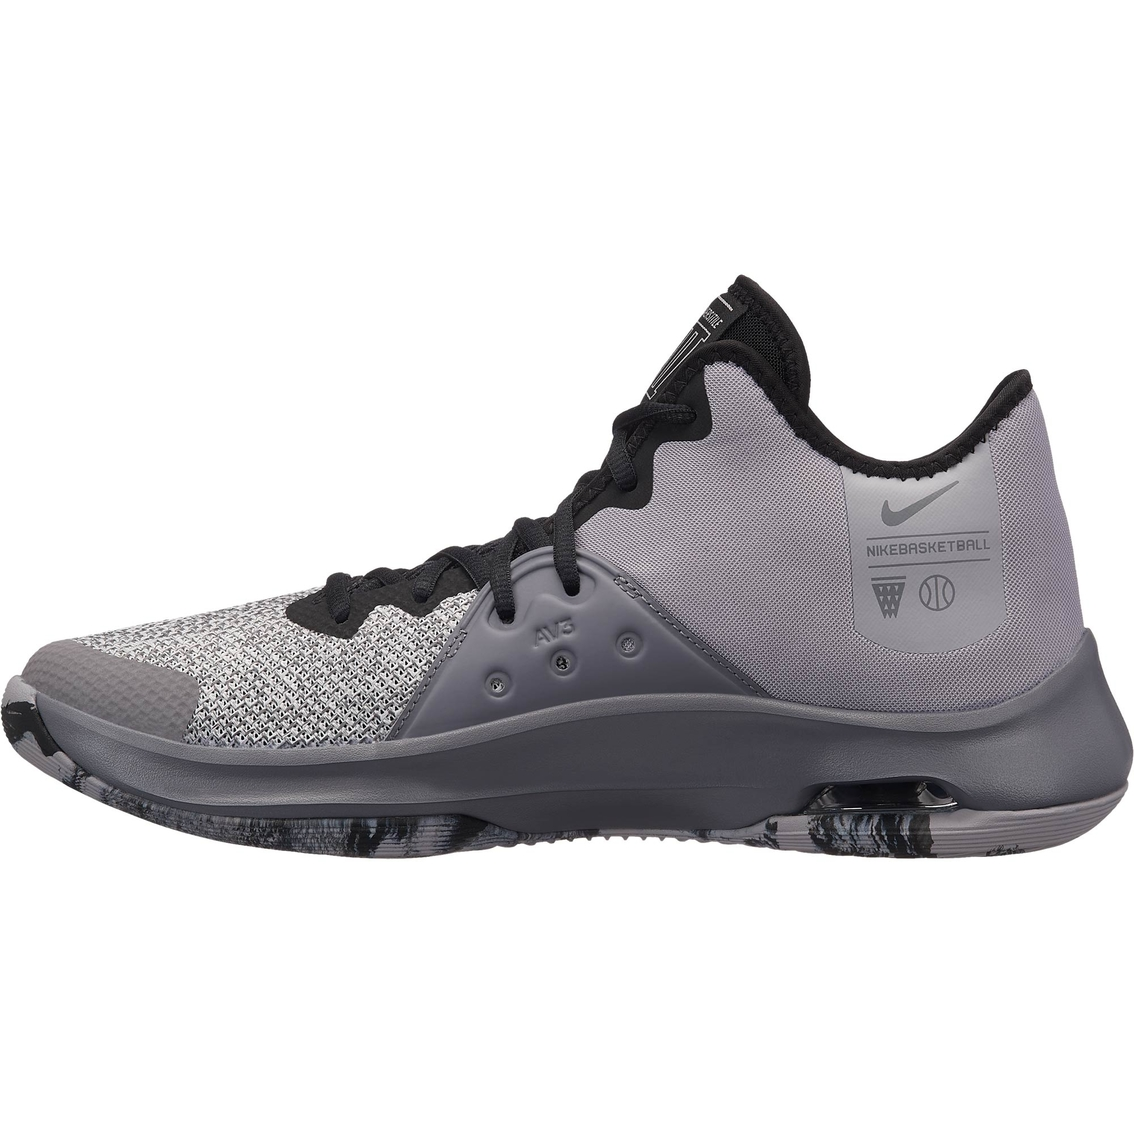 watch 29860 394c3 Nike Men s Versitile III Basketball Shoes